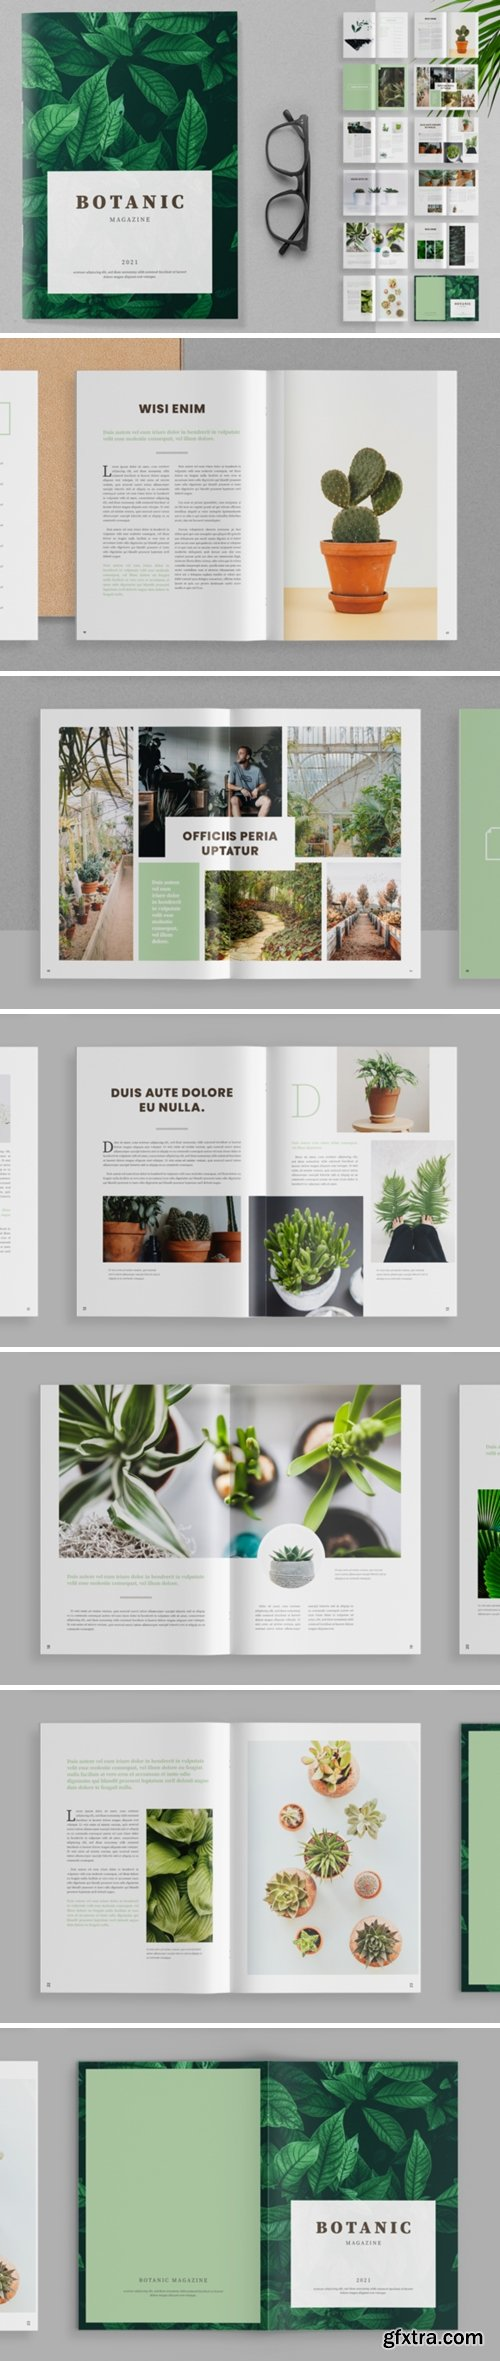 Botanic Magazine Template 7857992